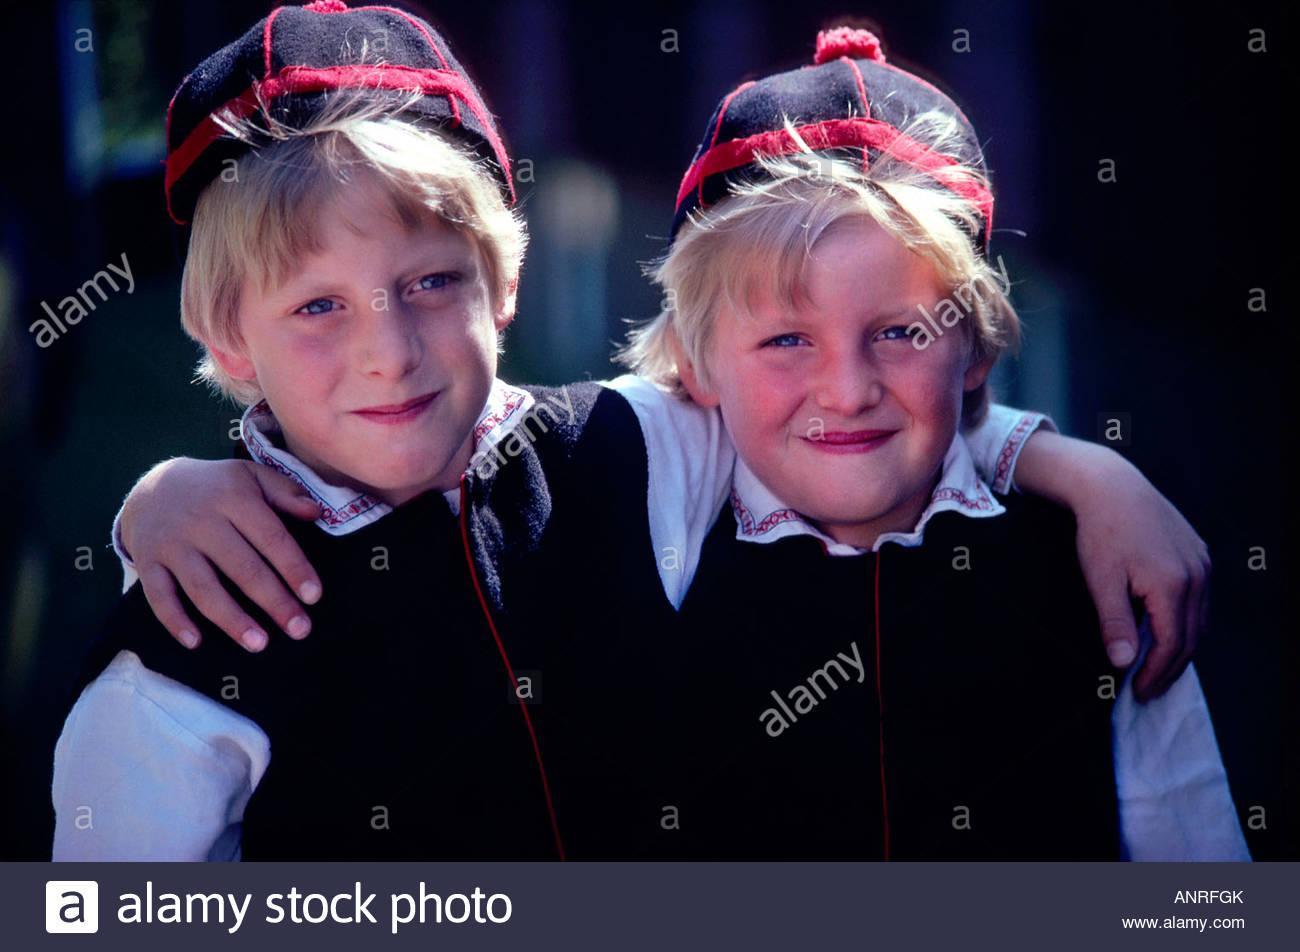 Two Swedish brothers in native costume celebrating Midsummer in Siljansnas Dalarna Province Sweden - Stock Image